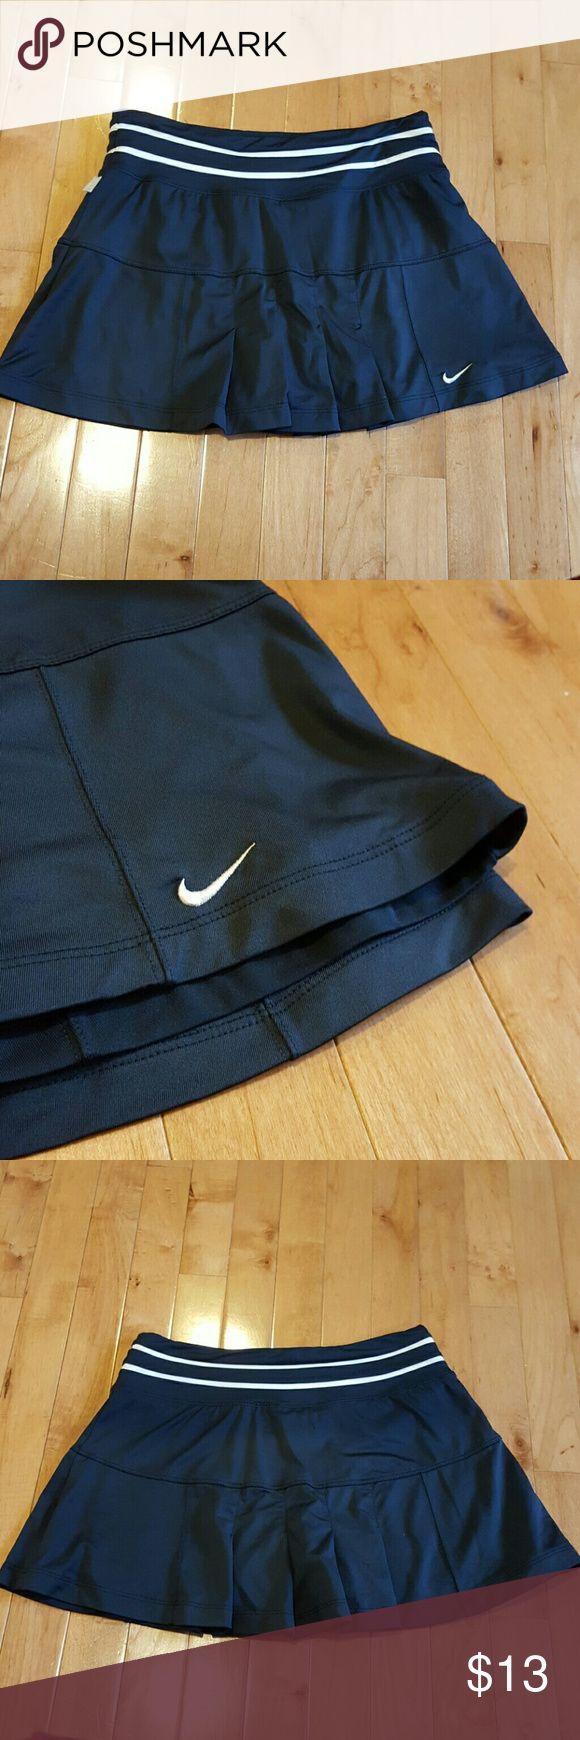 Nike Tennis Skort Navy blue Dri-fit Nike tennis skort. Perfect condition, never worn! Nike Shorts Skorts